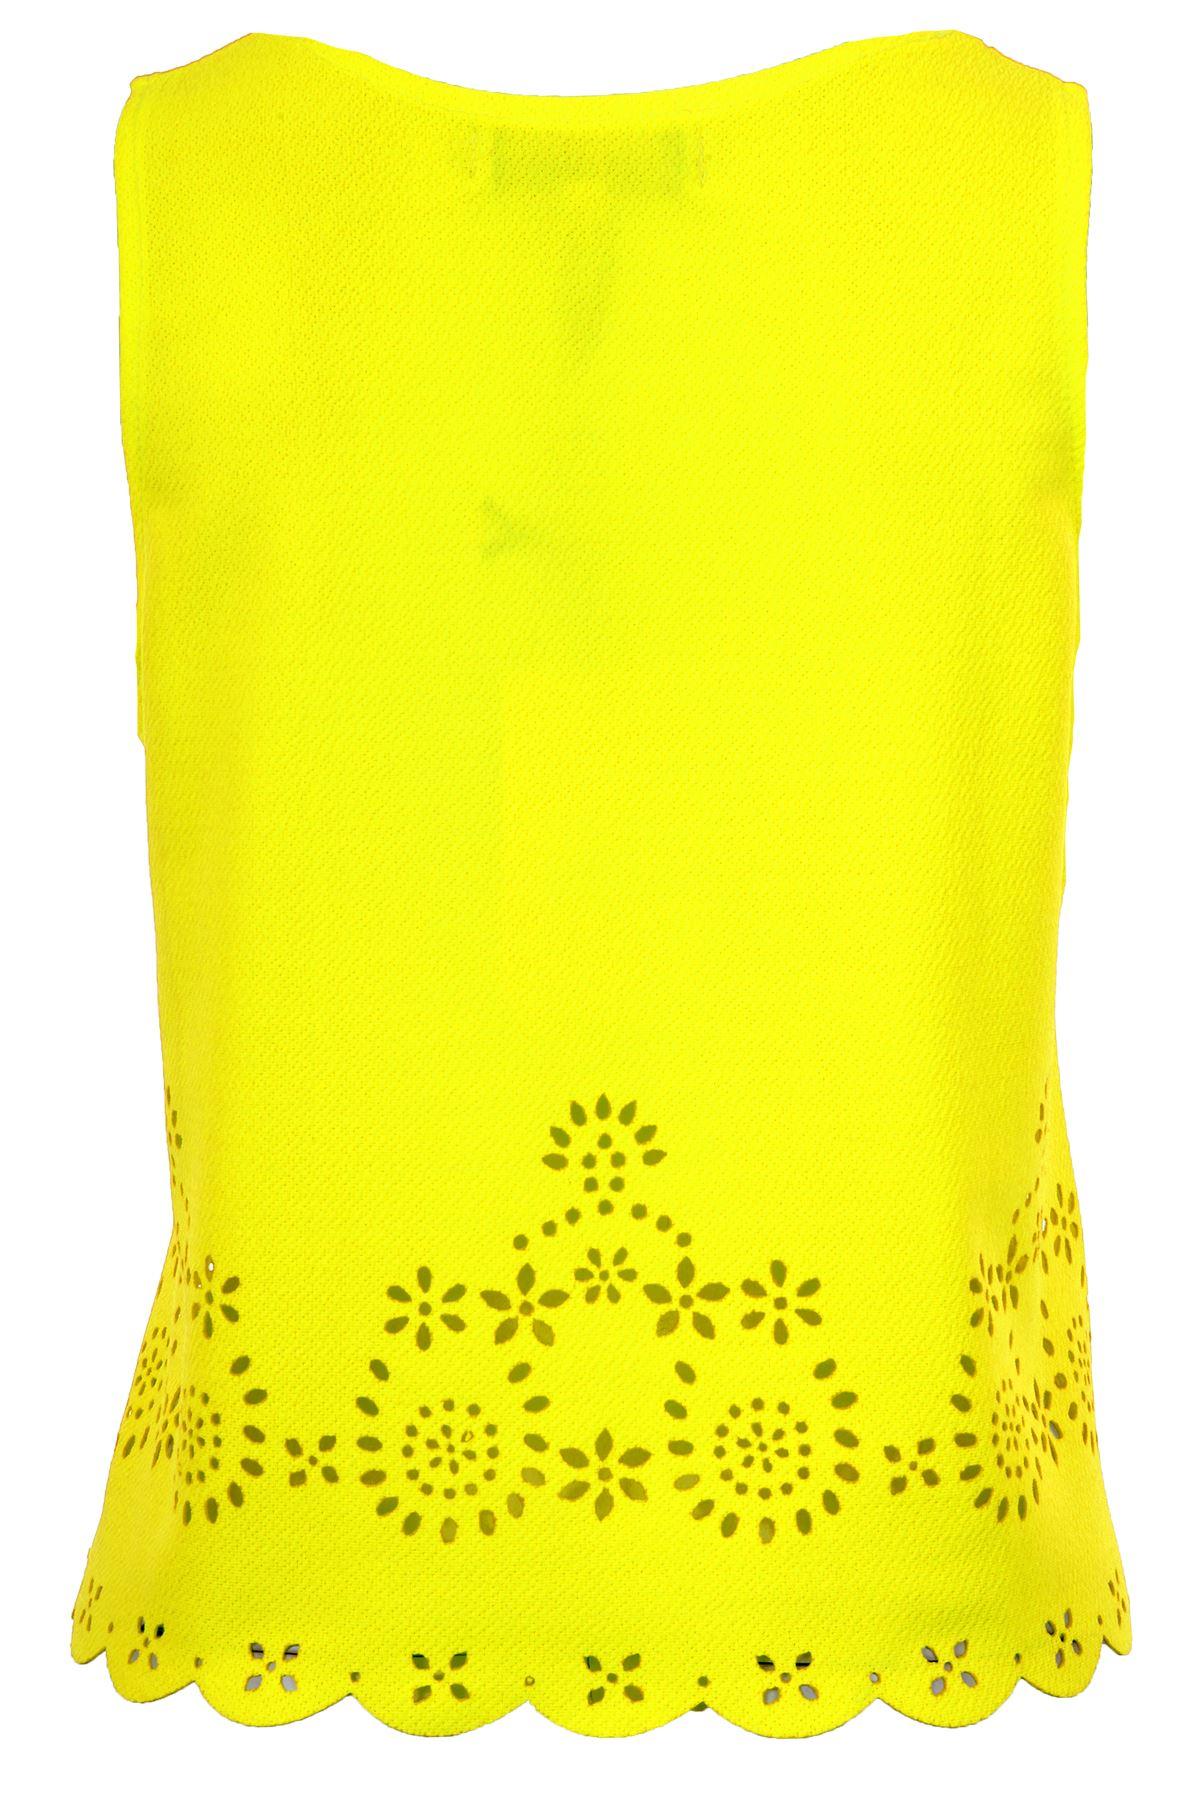 Ladies Scallop Hem Summer Top Women/'s Floral Cut out Trim Sleeveless Vest